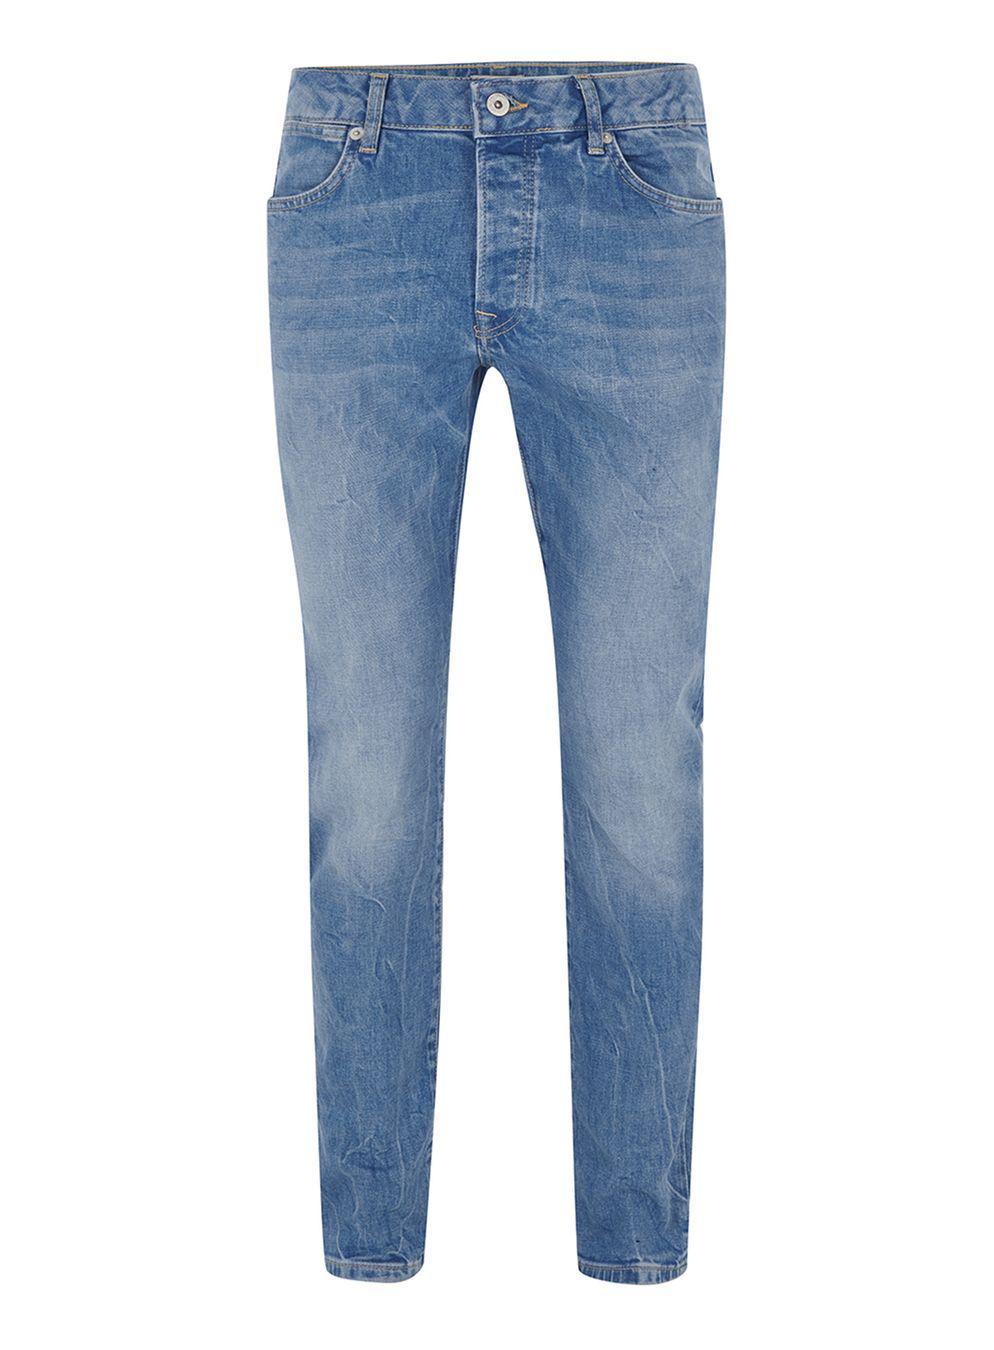 lyst topman bright blue stretch slim jeans in gray for men. Black Bedroom Furniture Sets. Home Design Ideas